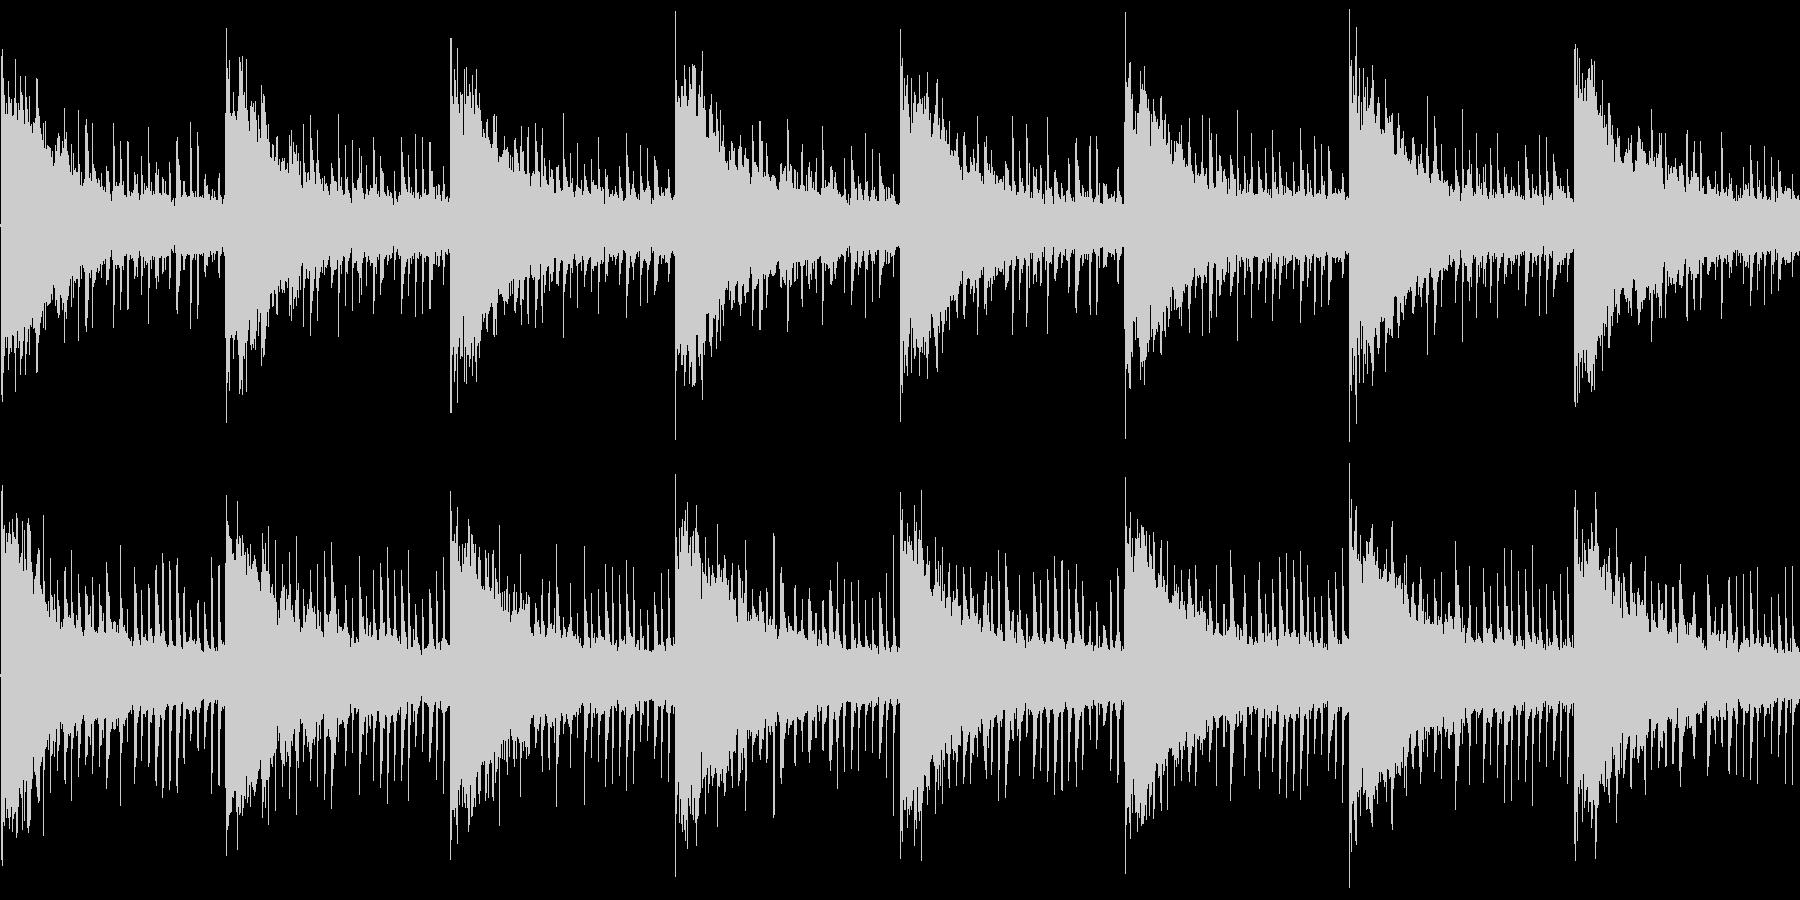 BGM002 ゲームでの洞窟や暗闇など…の未再生の波形